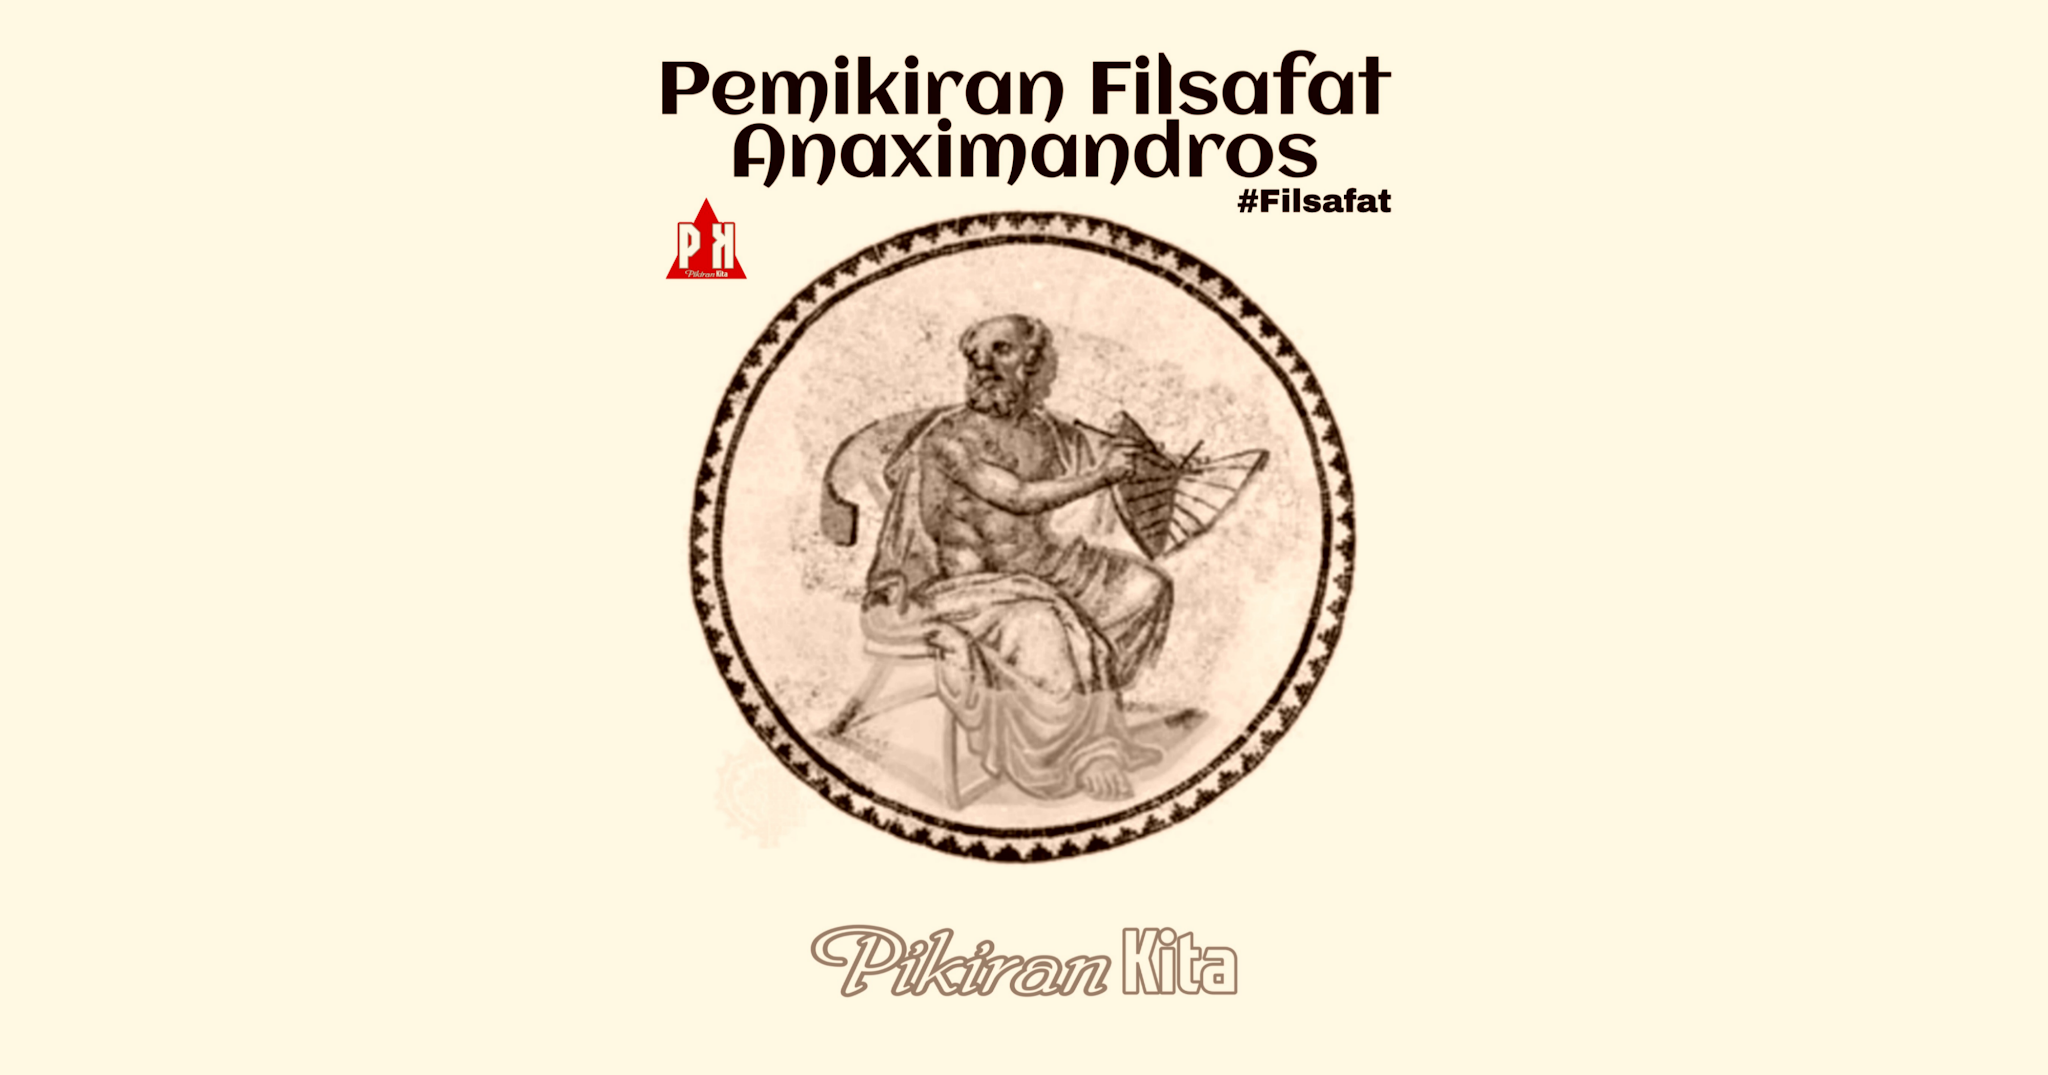 Pemikiran Filsafat Anaximandros